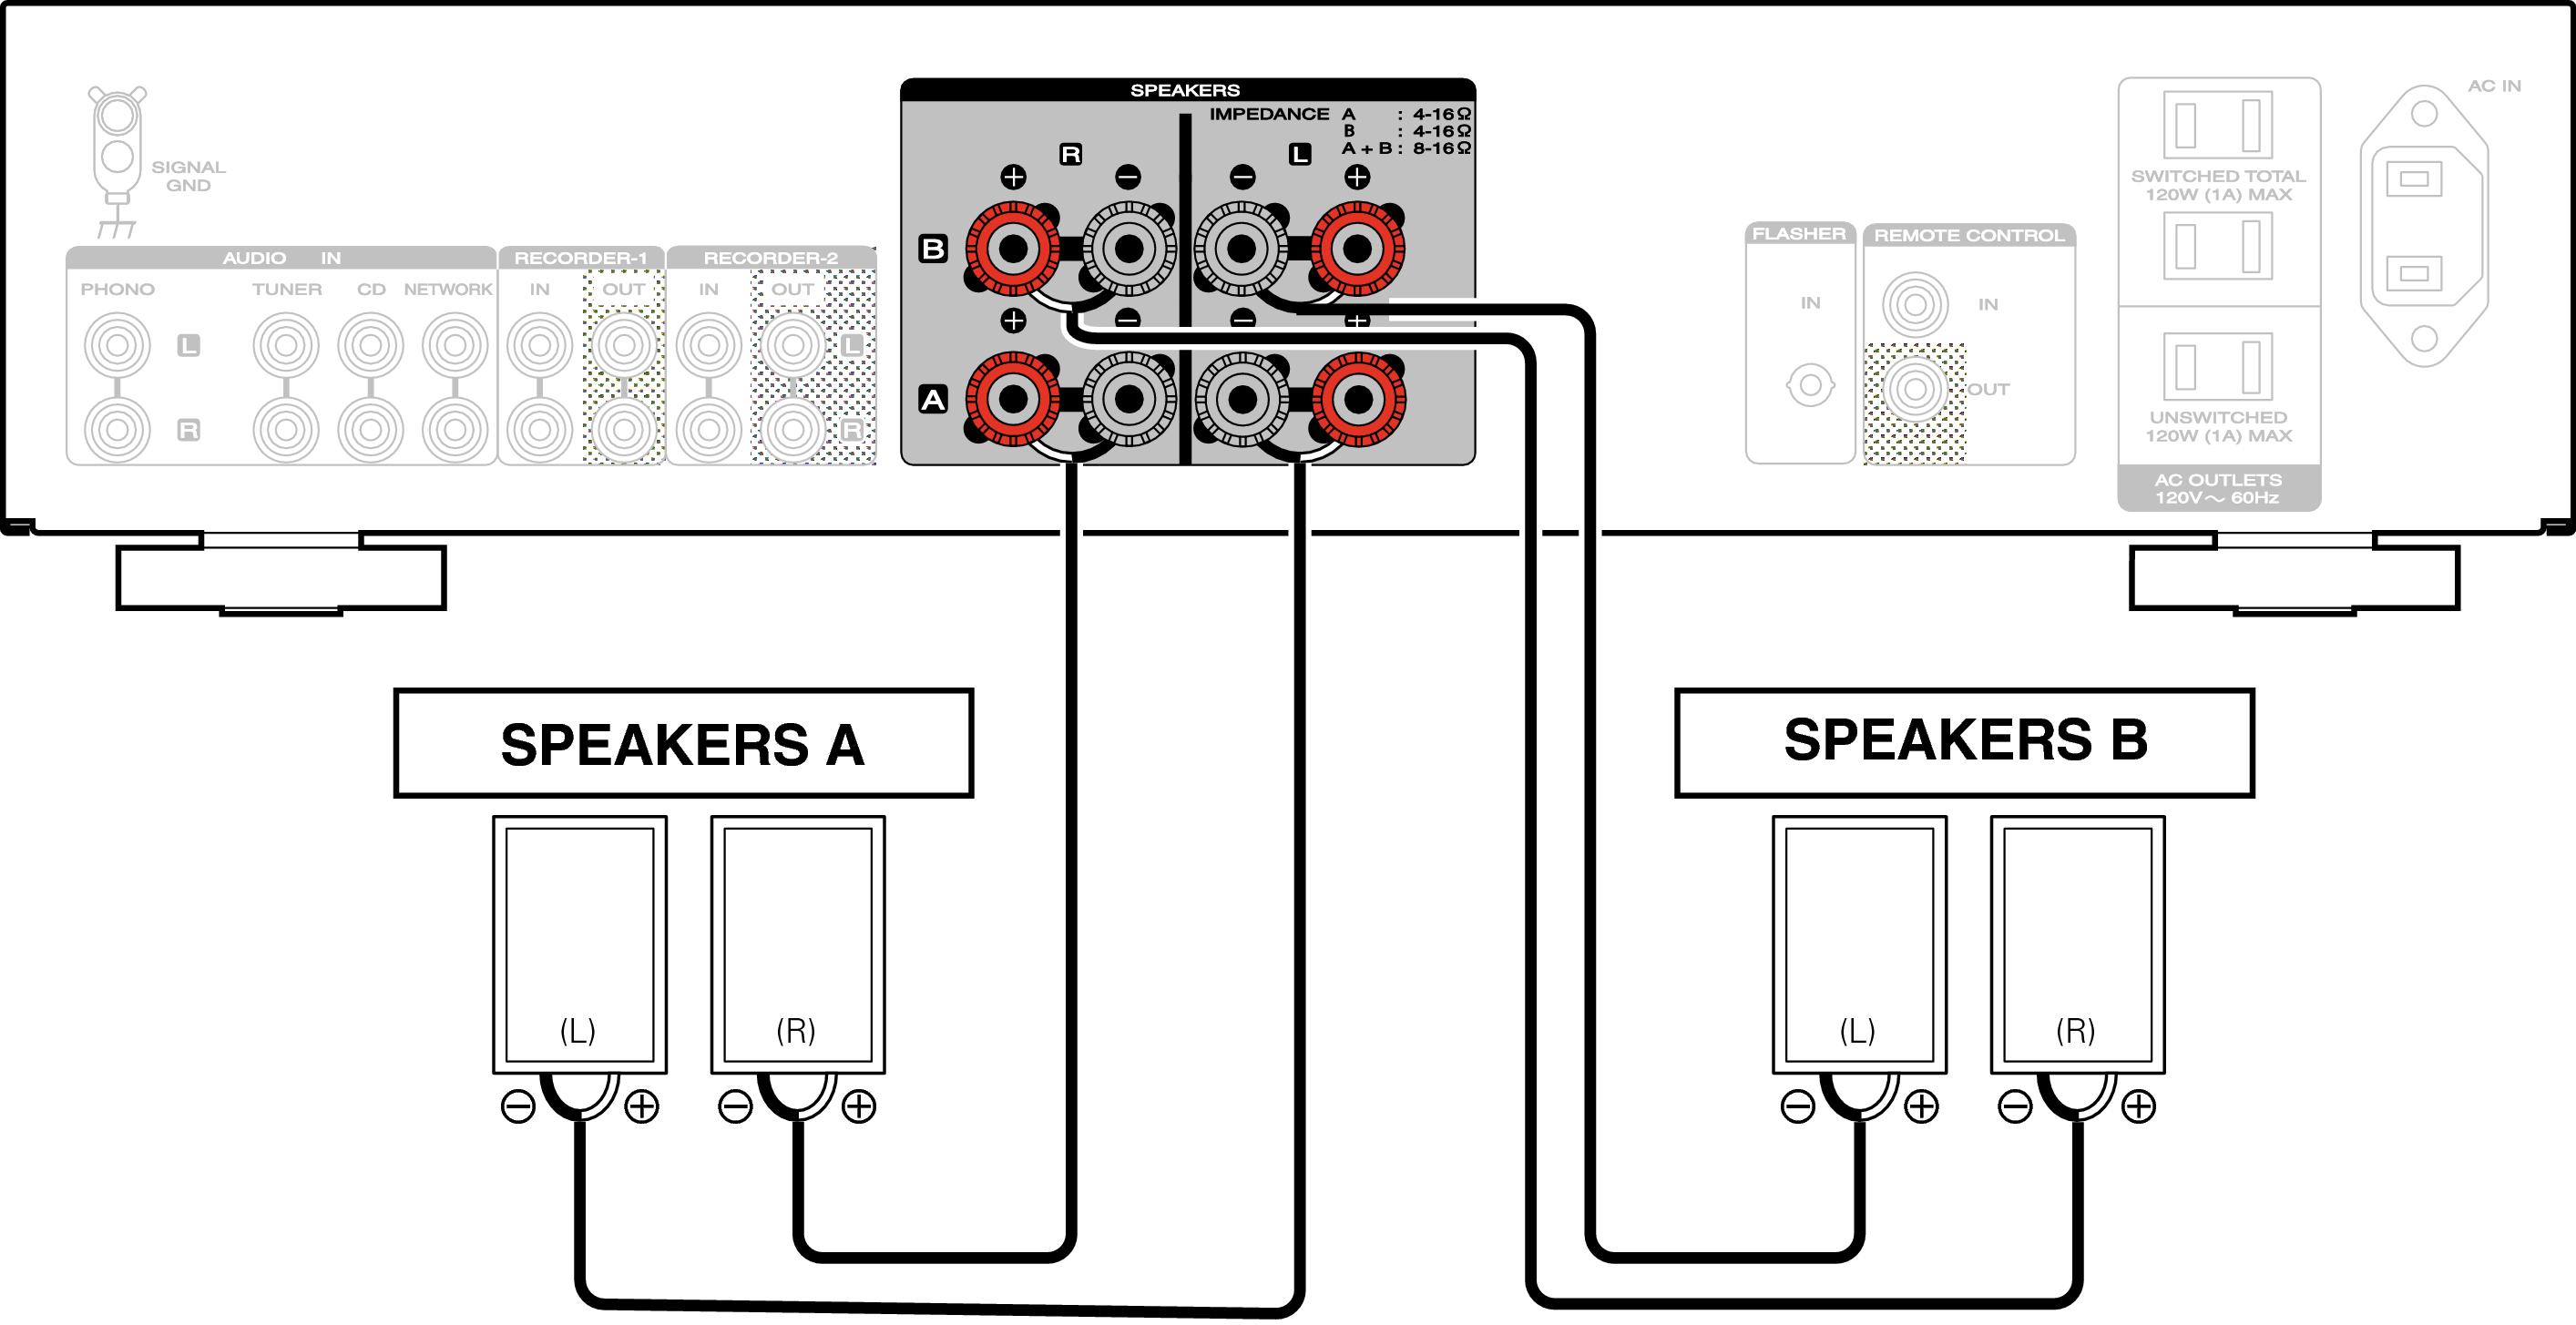 Conn%20spAB%20U_OFAQILzigdnsbq Speaker Wiring Diagram Series Vs Parallel on